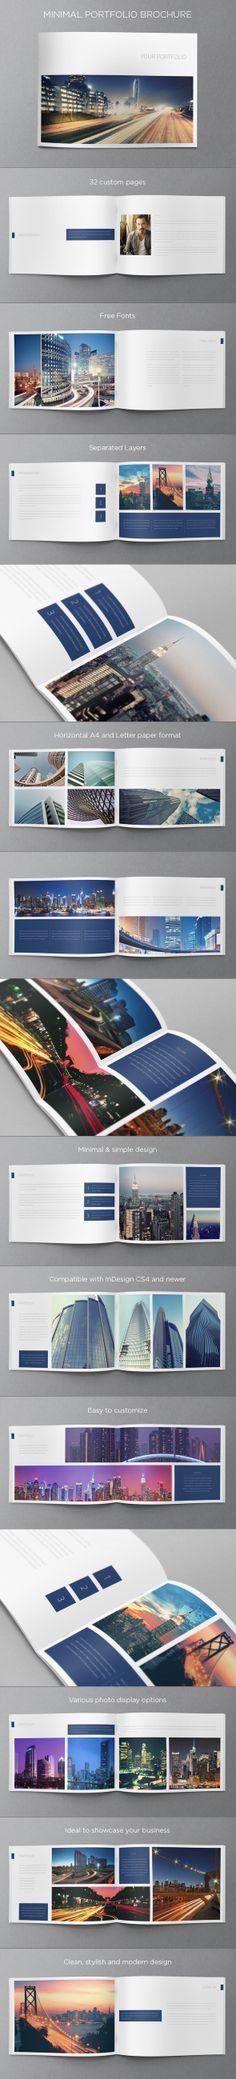 Minimal Portfolio Brochure. Download here: http://graphicriver.net/item/minimal-portfolio-brochure/5291229?ref=abradesign #design #brochure